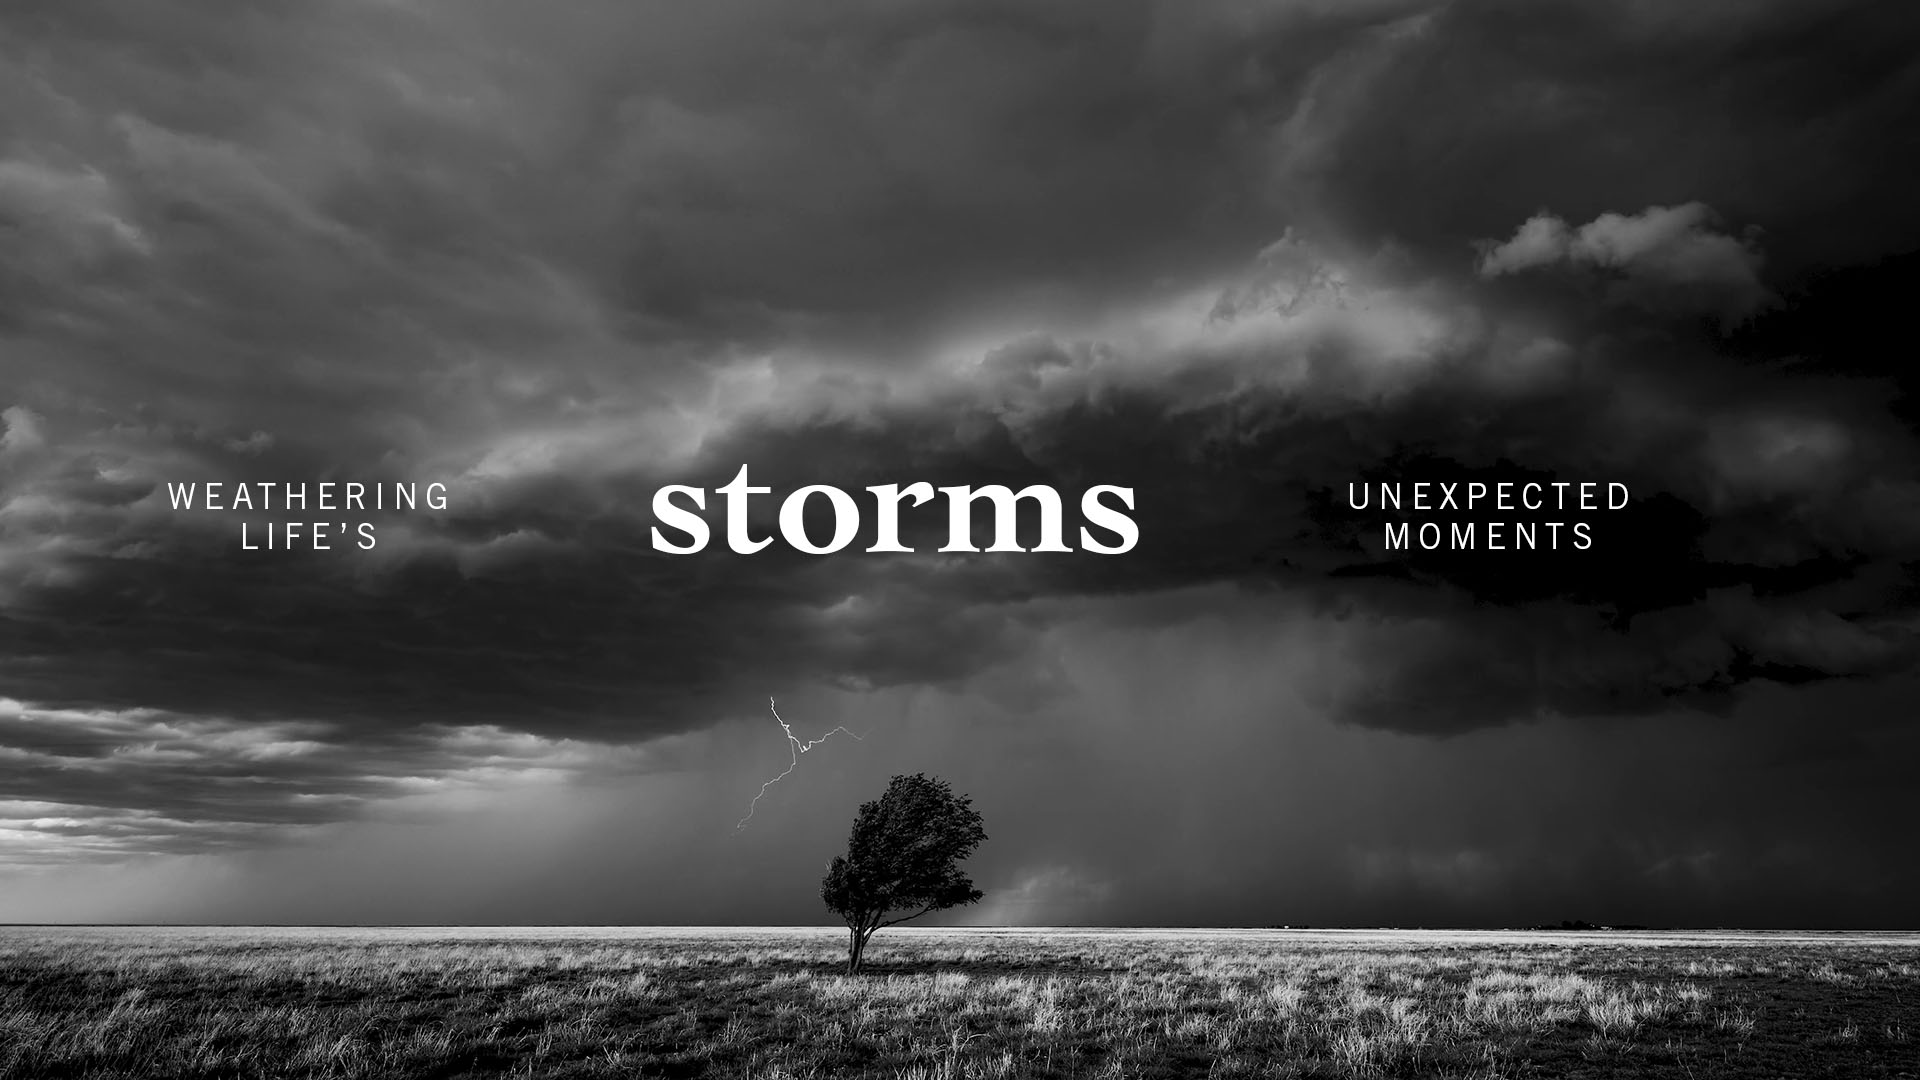 Storms-Main 1920x1080.jpg